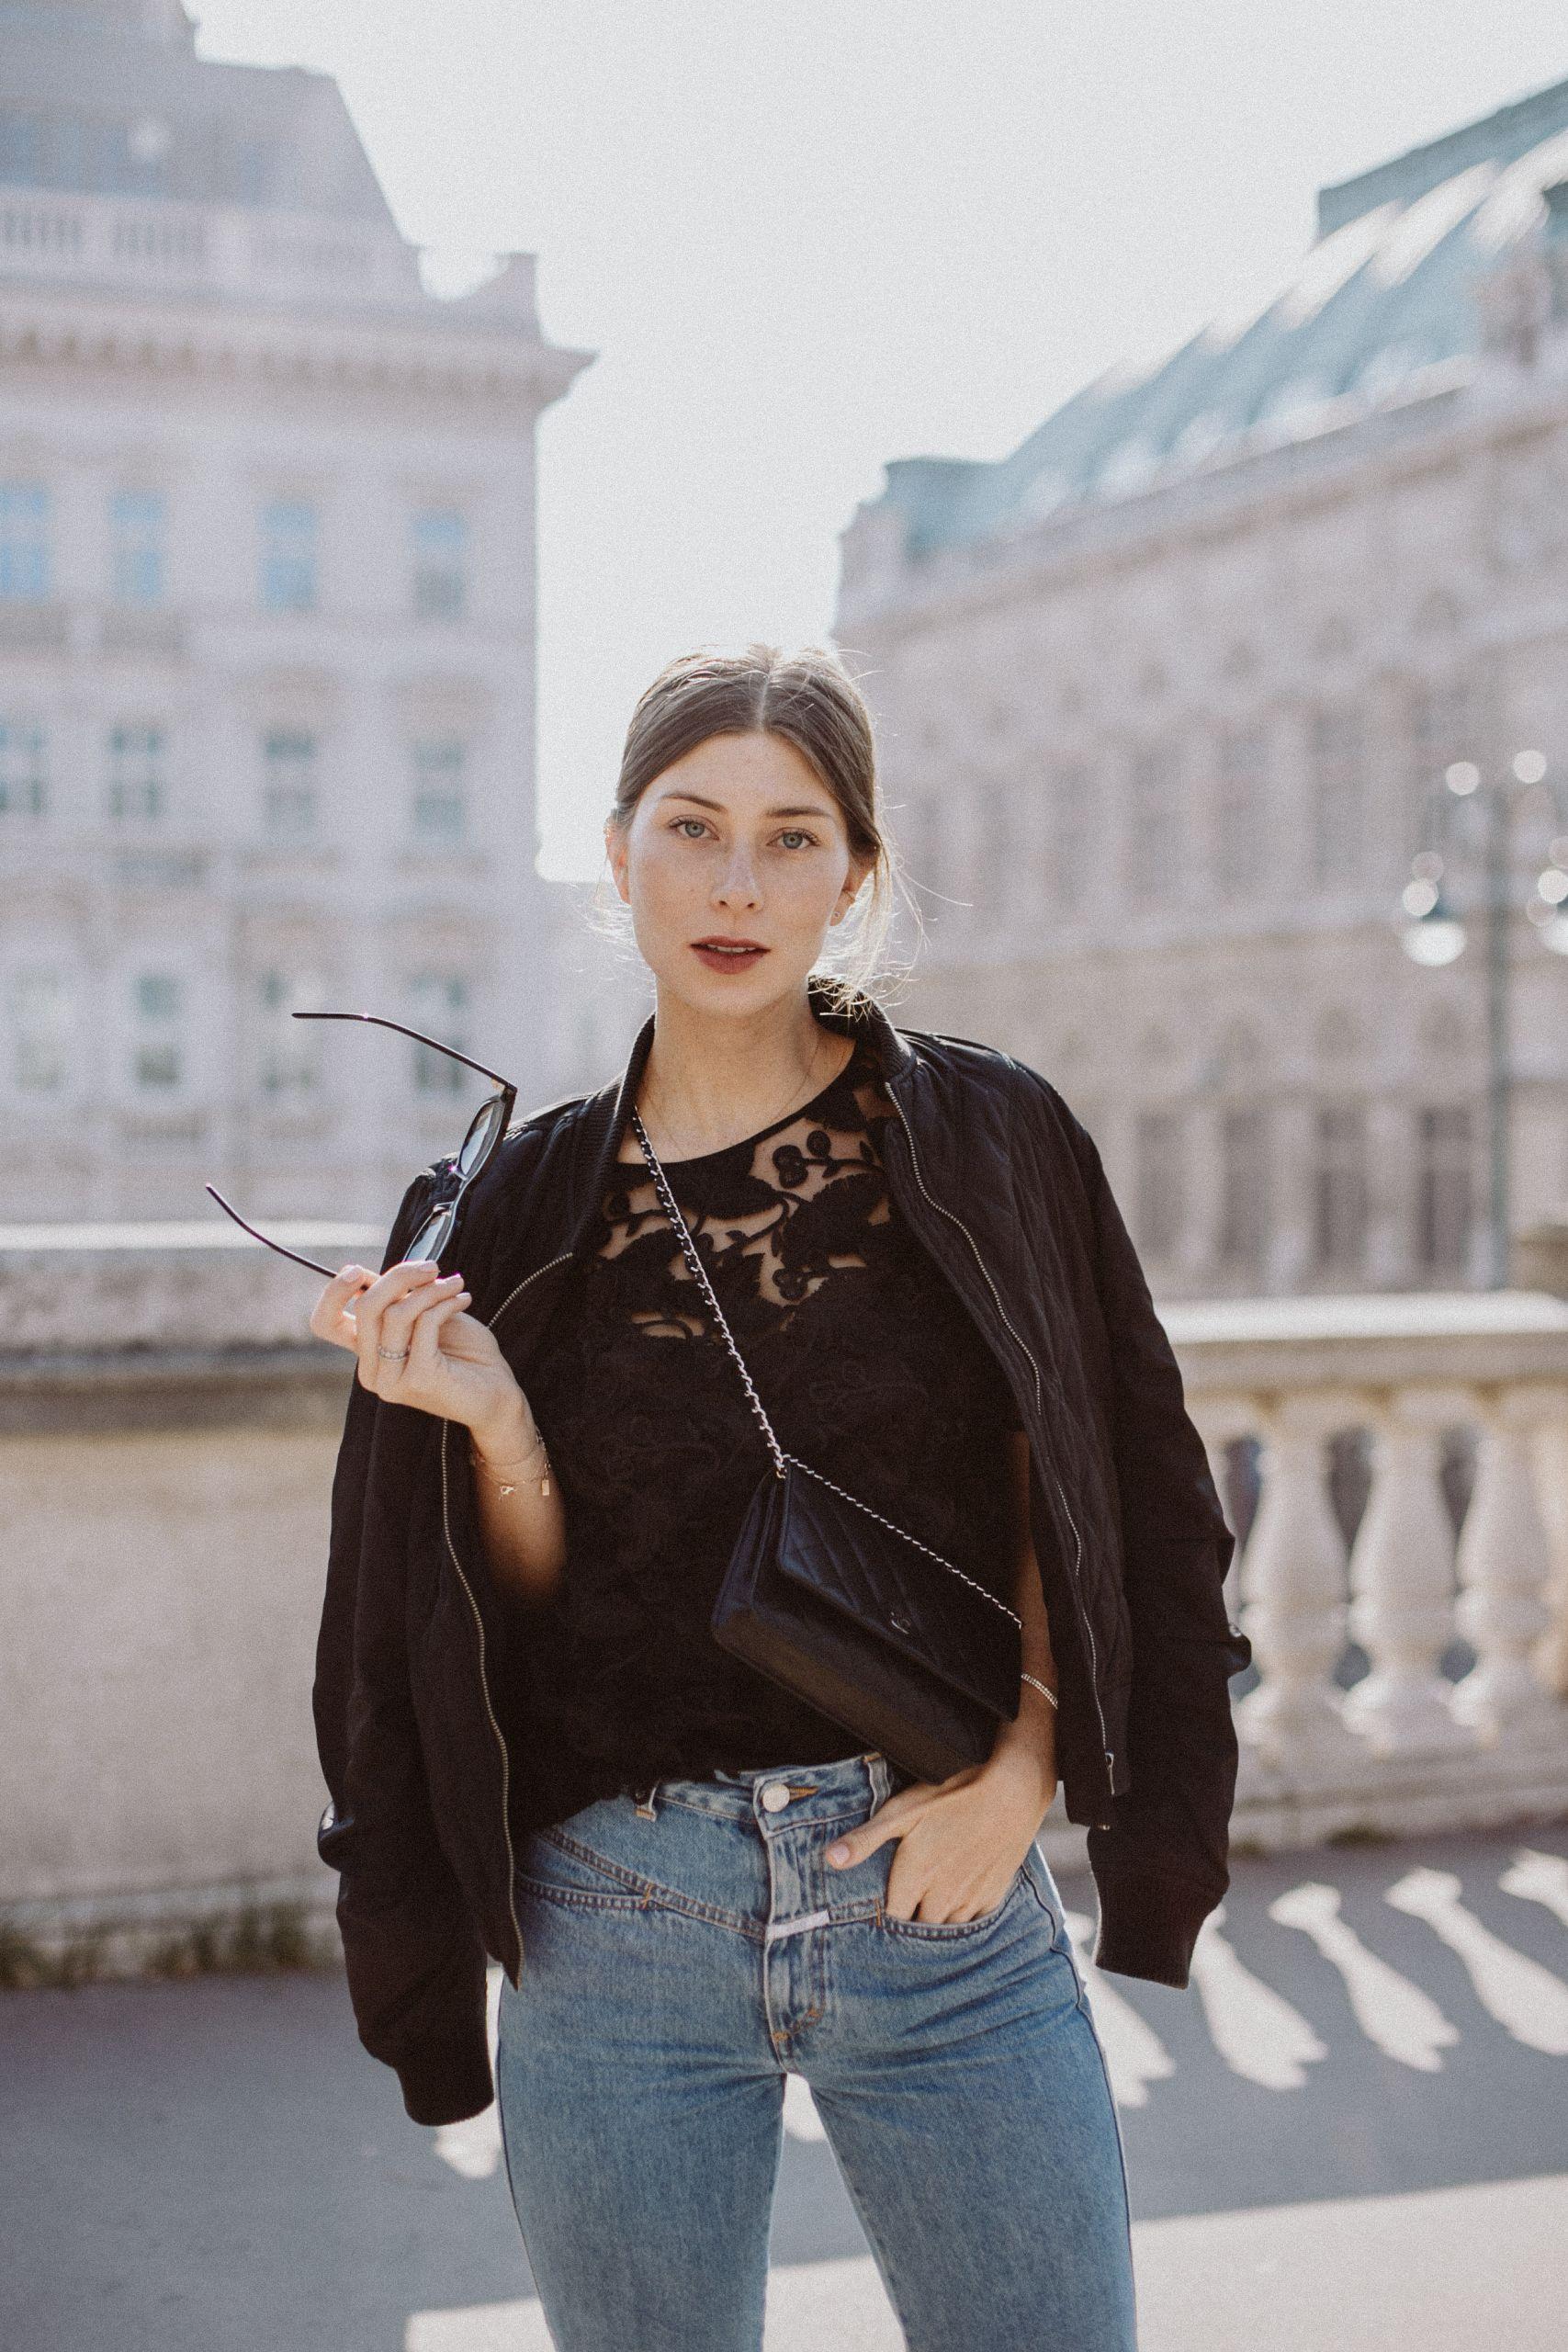 Steals & Finds: Transition Jacket Trends / Übergangsjacken 2018 / Jacken Trends Herbst | The Daily Dose